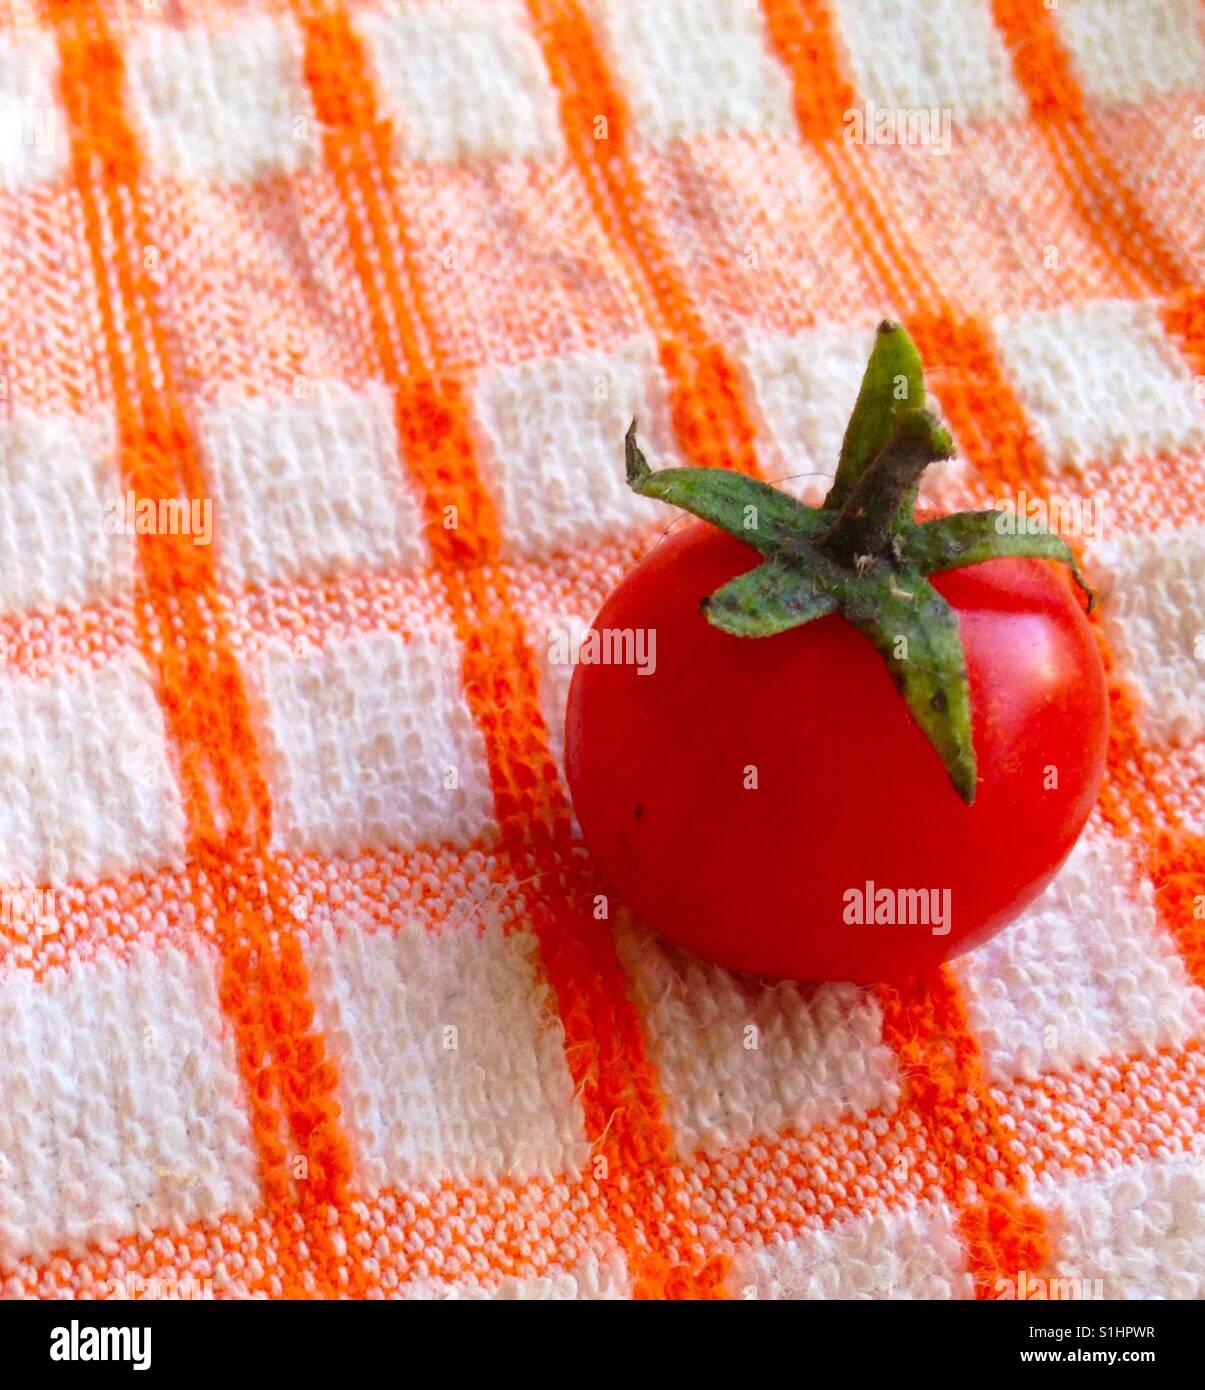 Cherry tomatoe - Stock Image